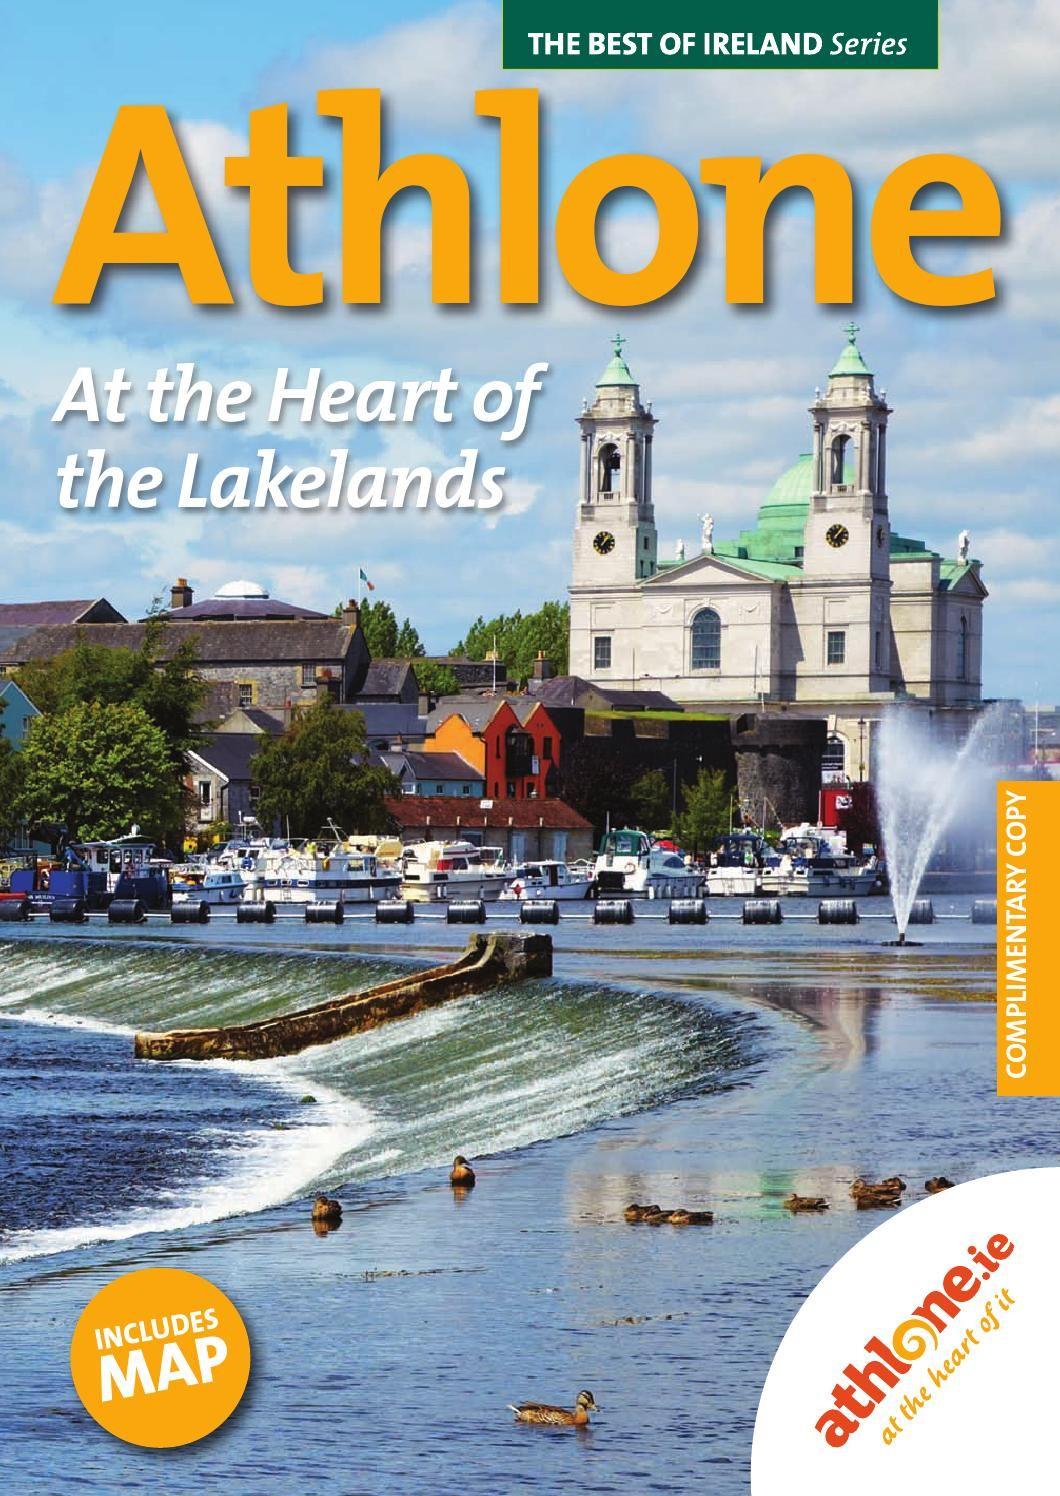 Free Online Dating In Athlone (Ireland, Leinster)